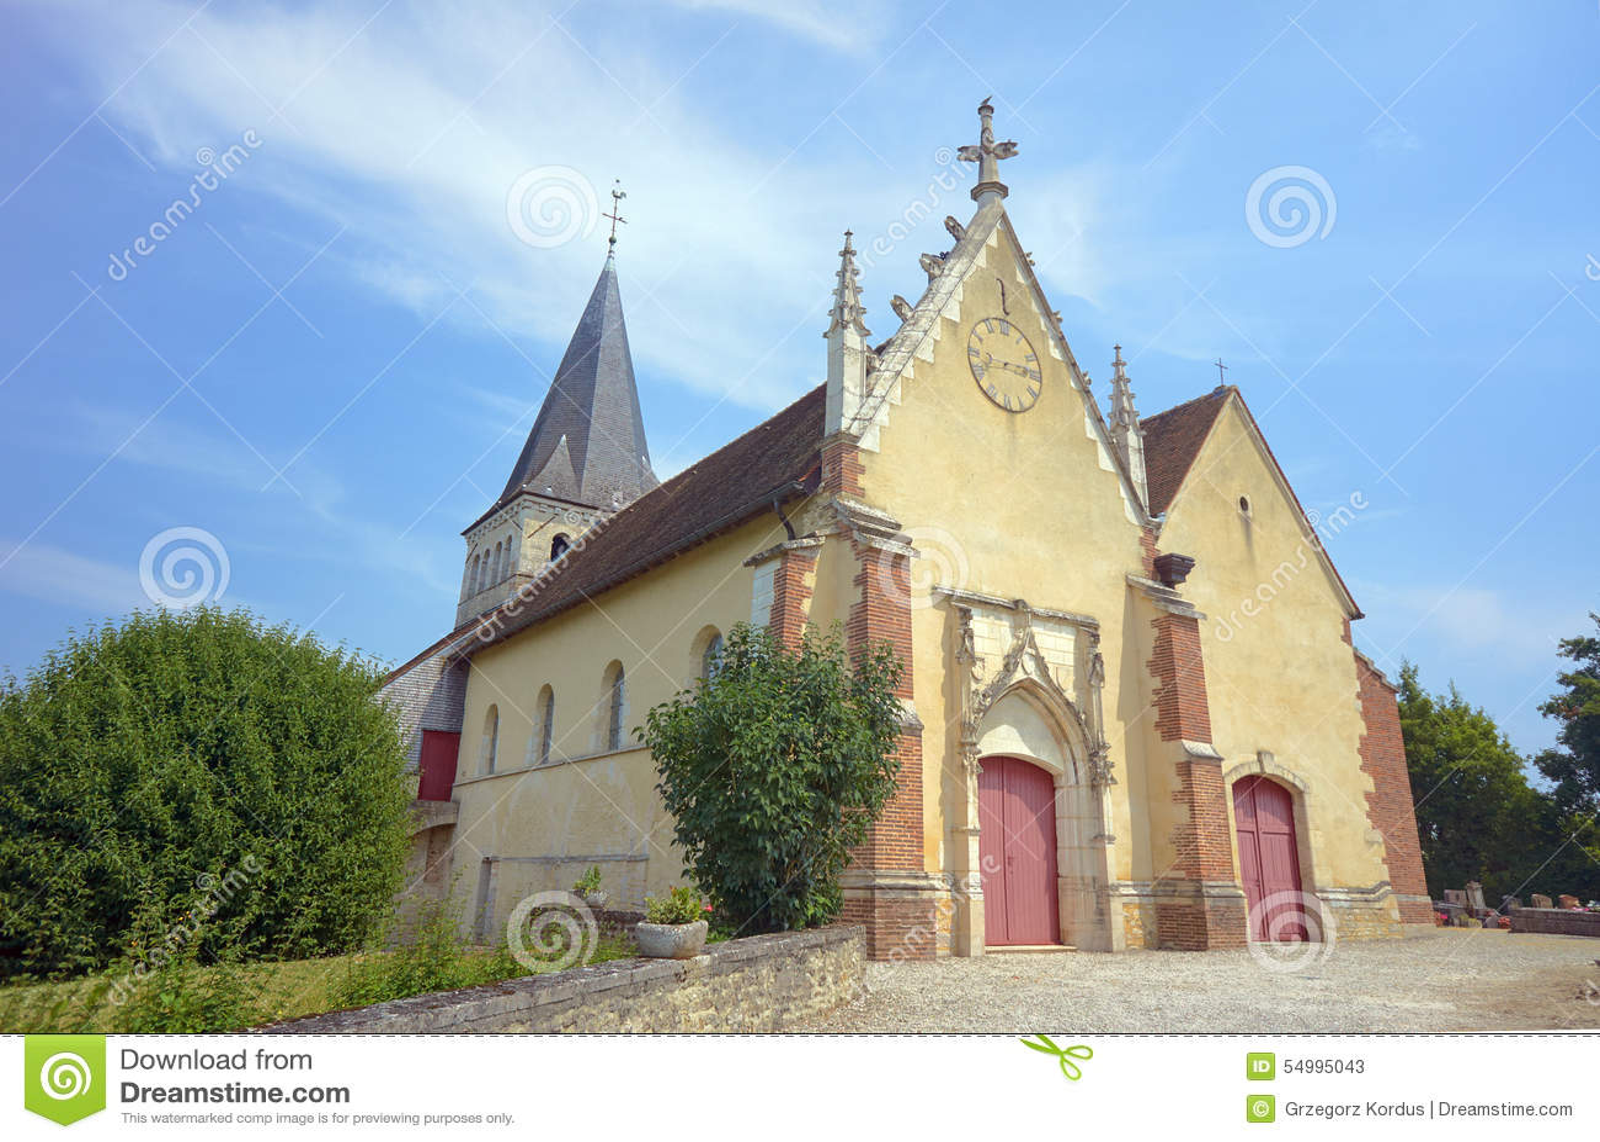 Den medeltida kyrkan i Champagne